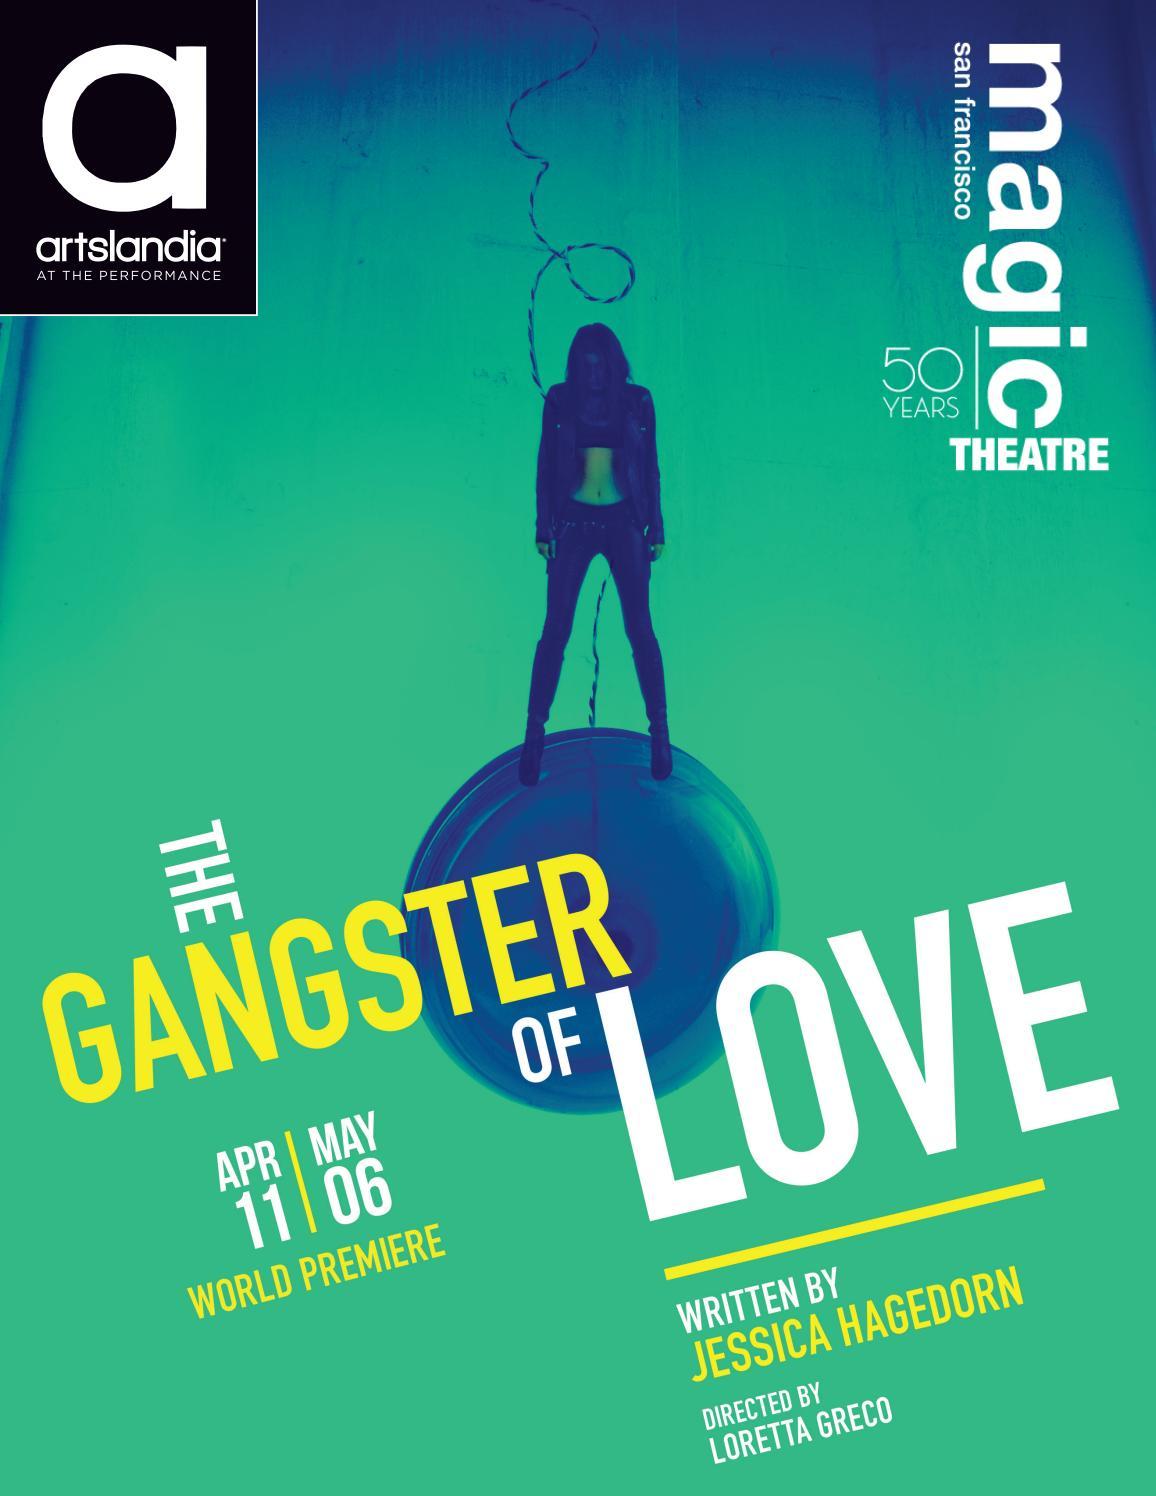 3efbf6dc461c The Gangster of Love - Magic Theatre by Artslandia - issuu